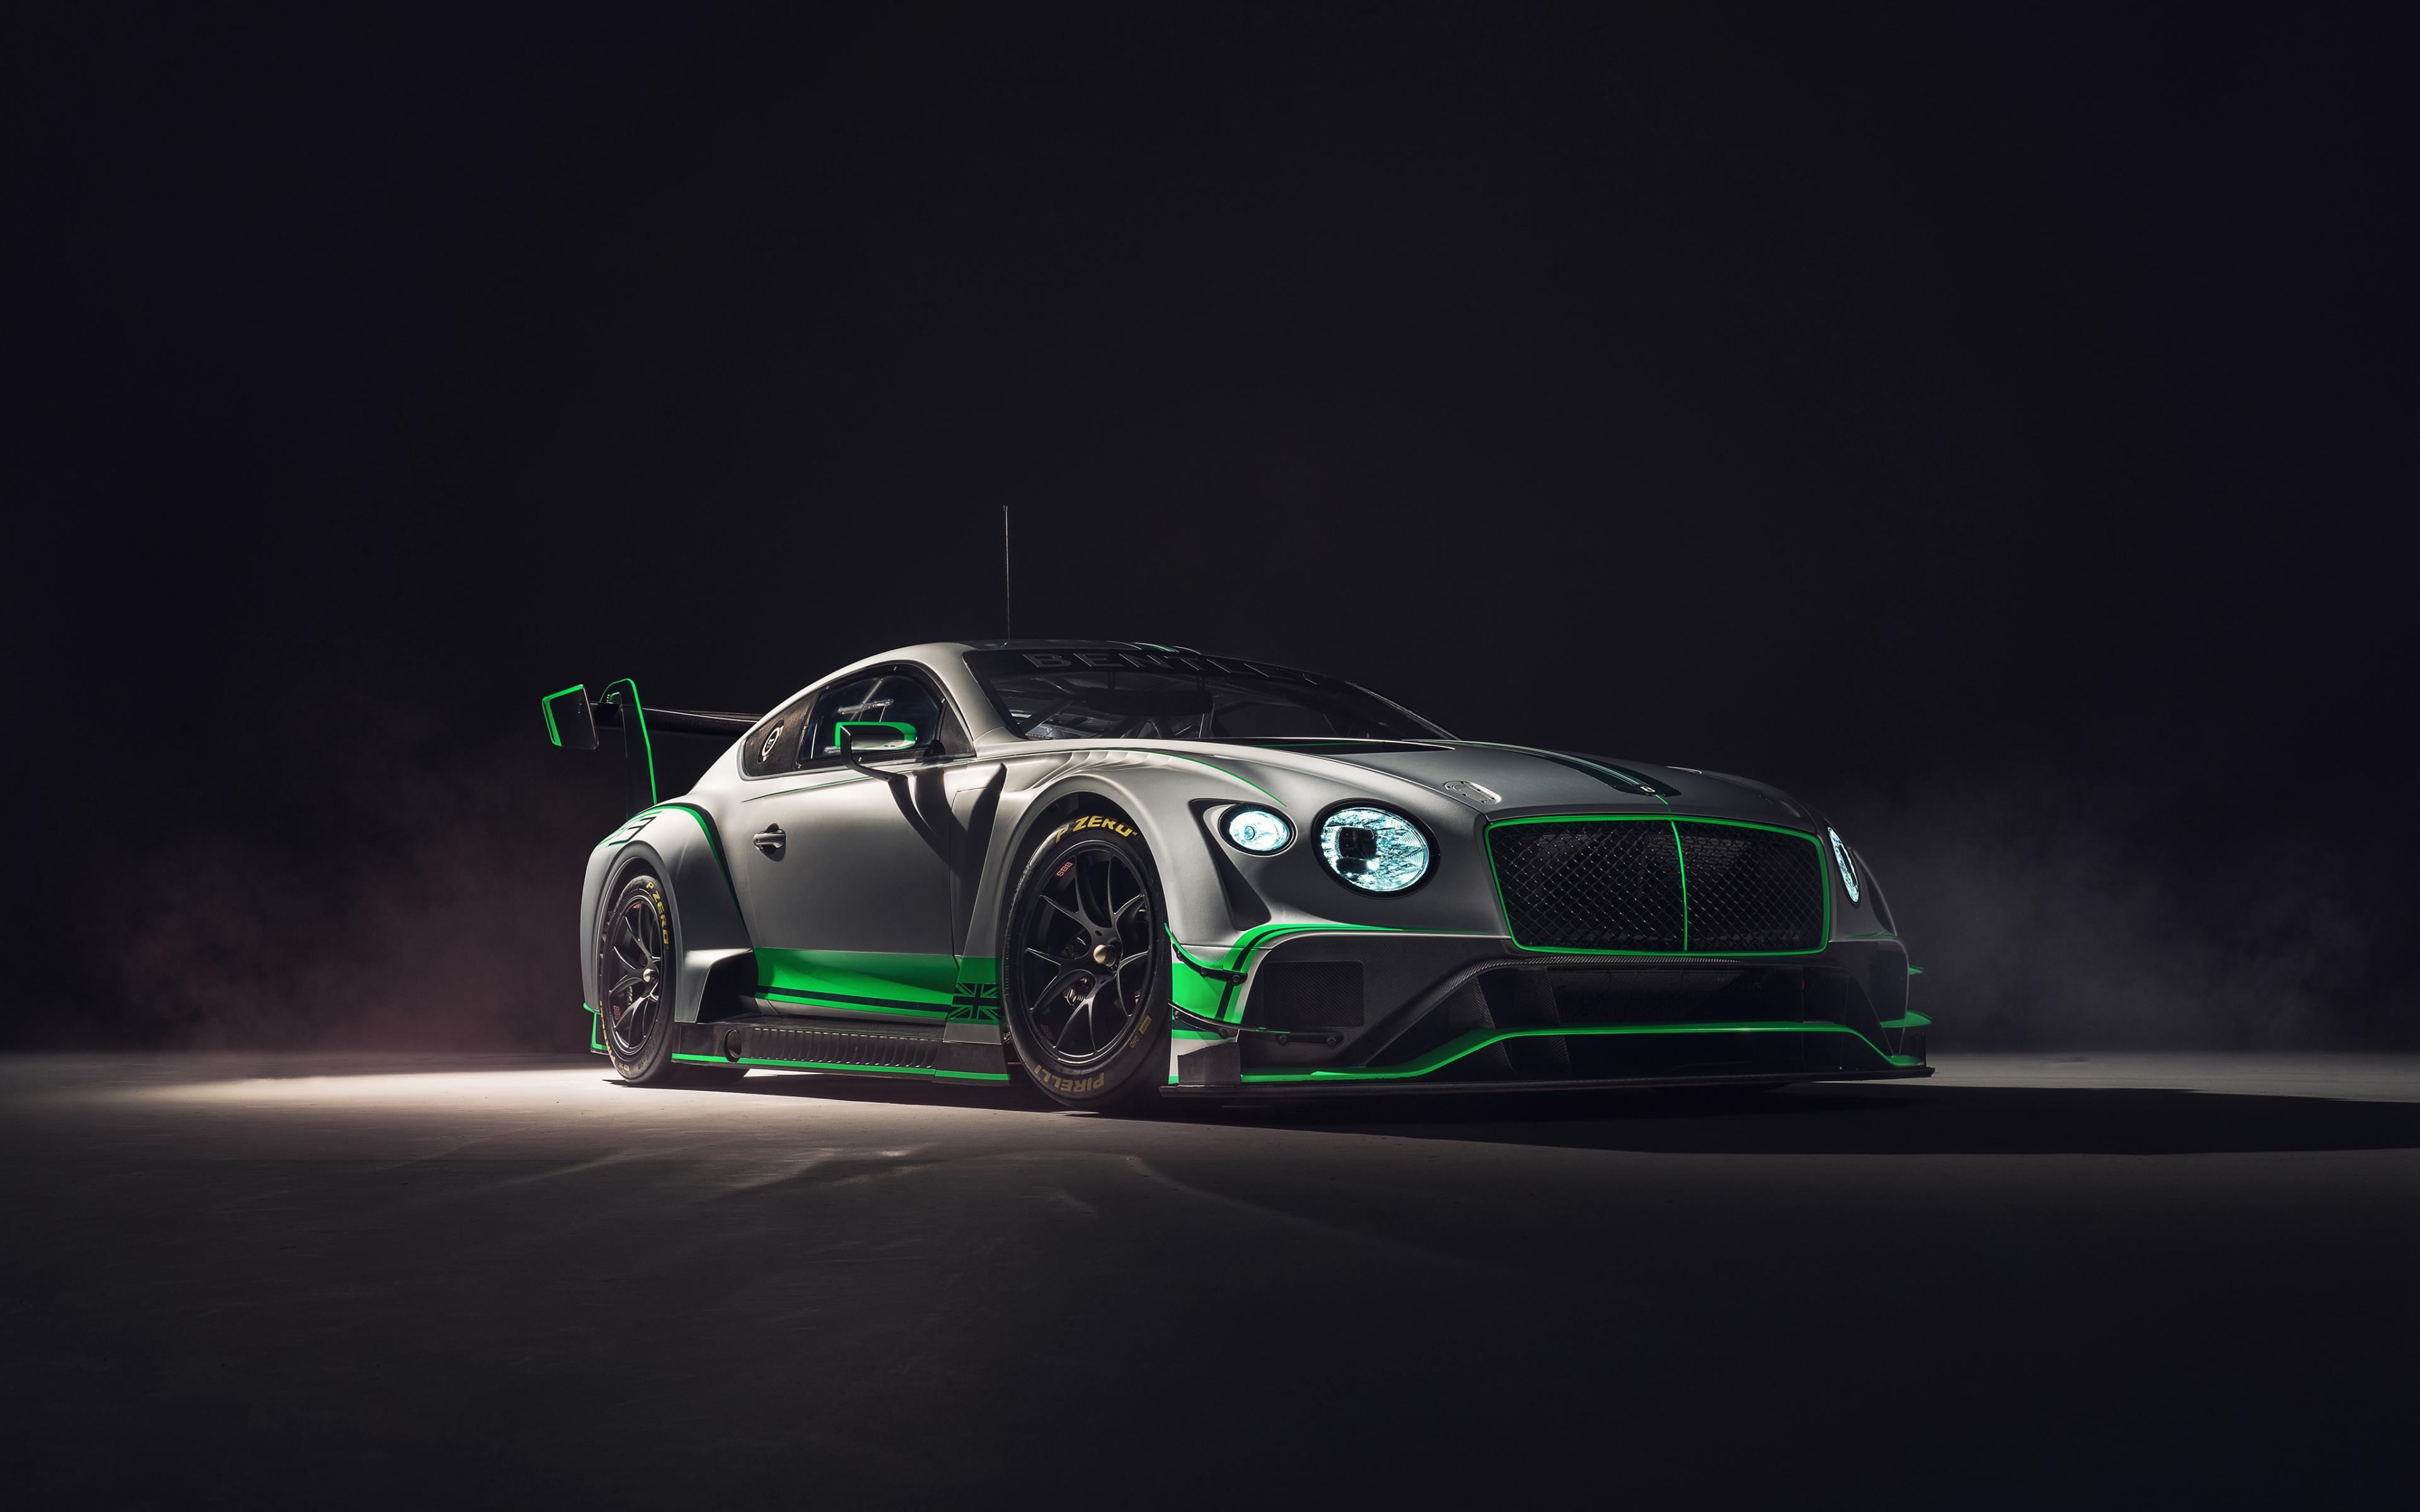 2018 Bentley Continental GT3, 2018 luxury car, 3840x2400 wallpaper